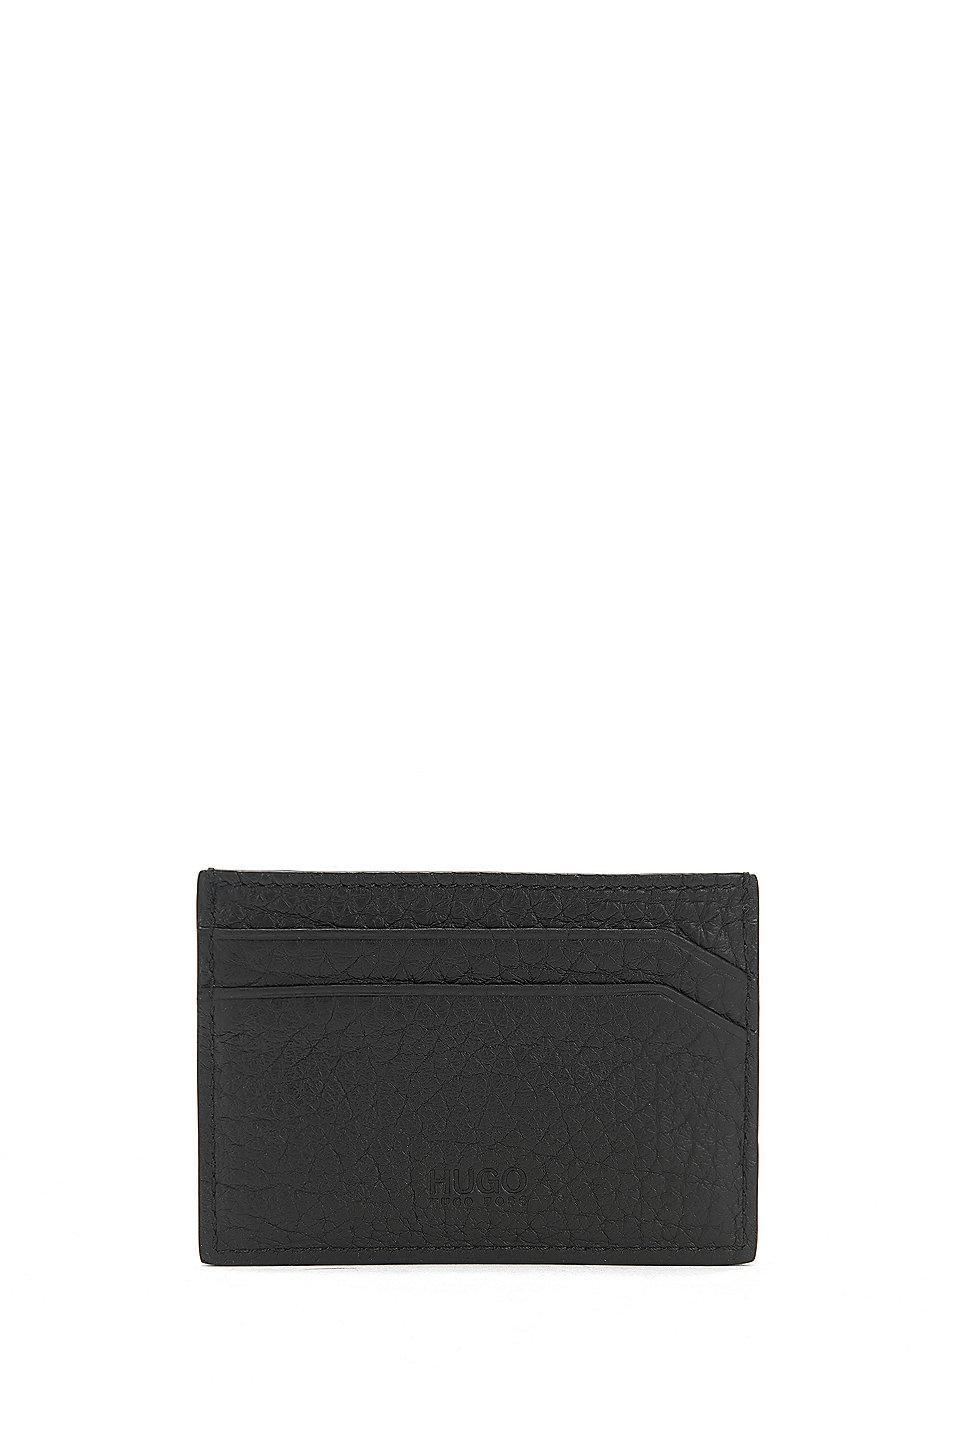 Hugo boss mens wallets leather wallets card holders studded leather cardholder victorian s s card black magicingreecefo Images